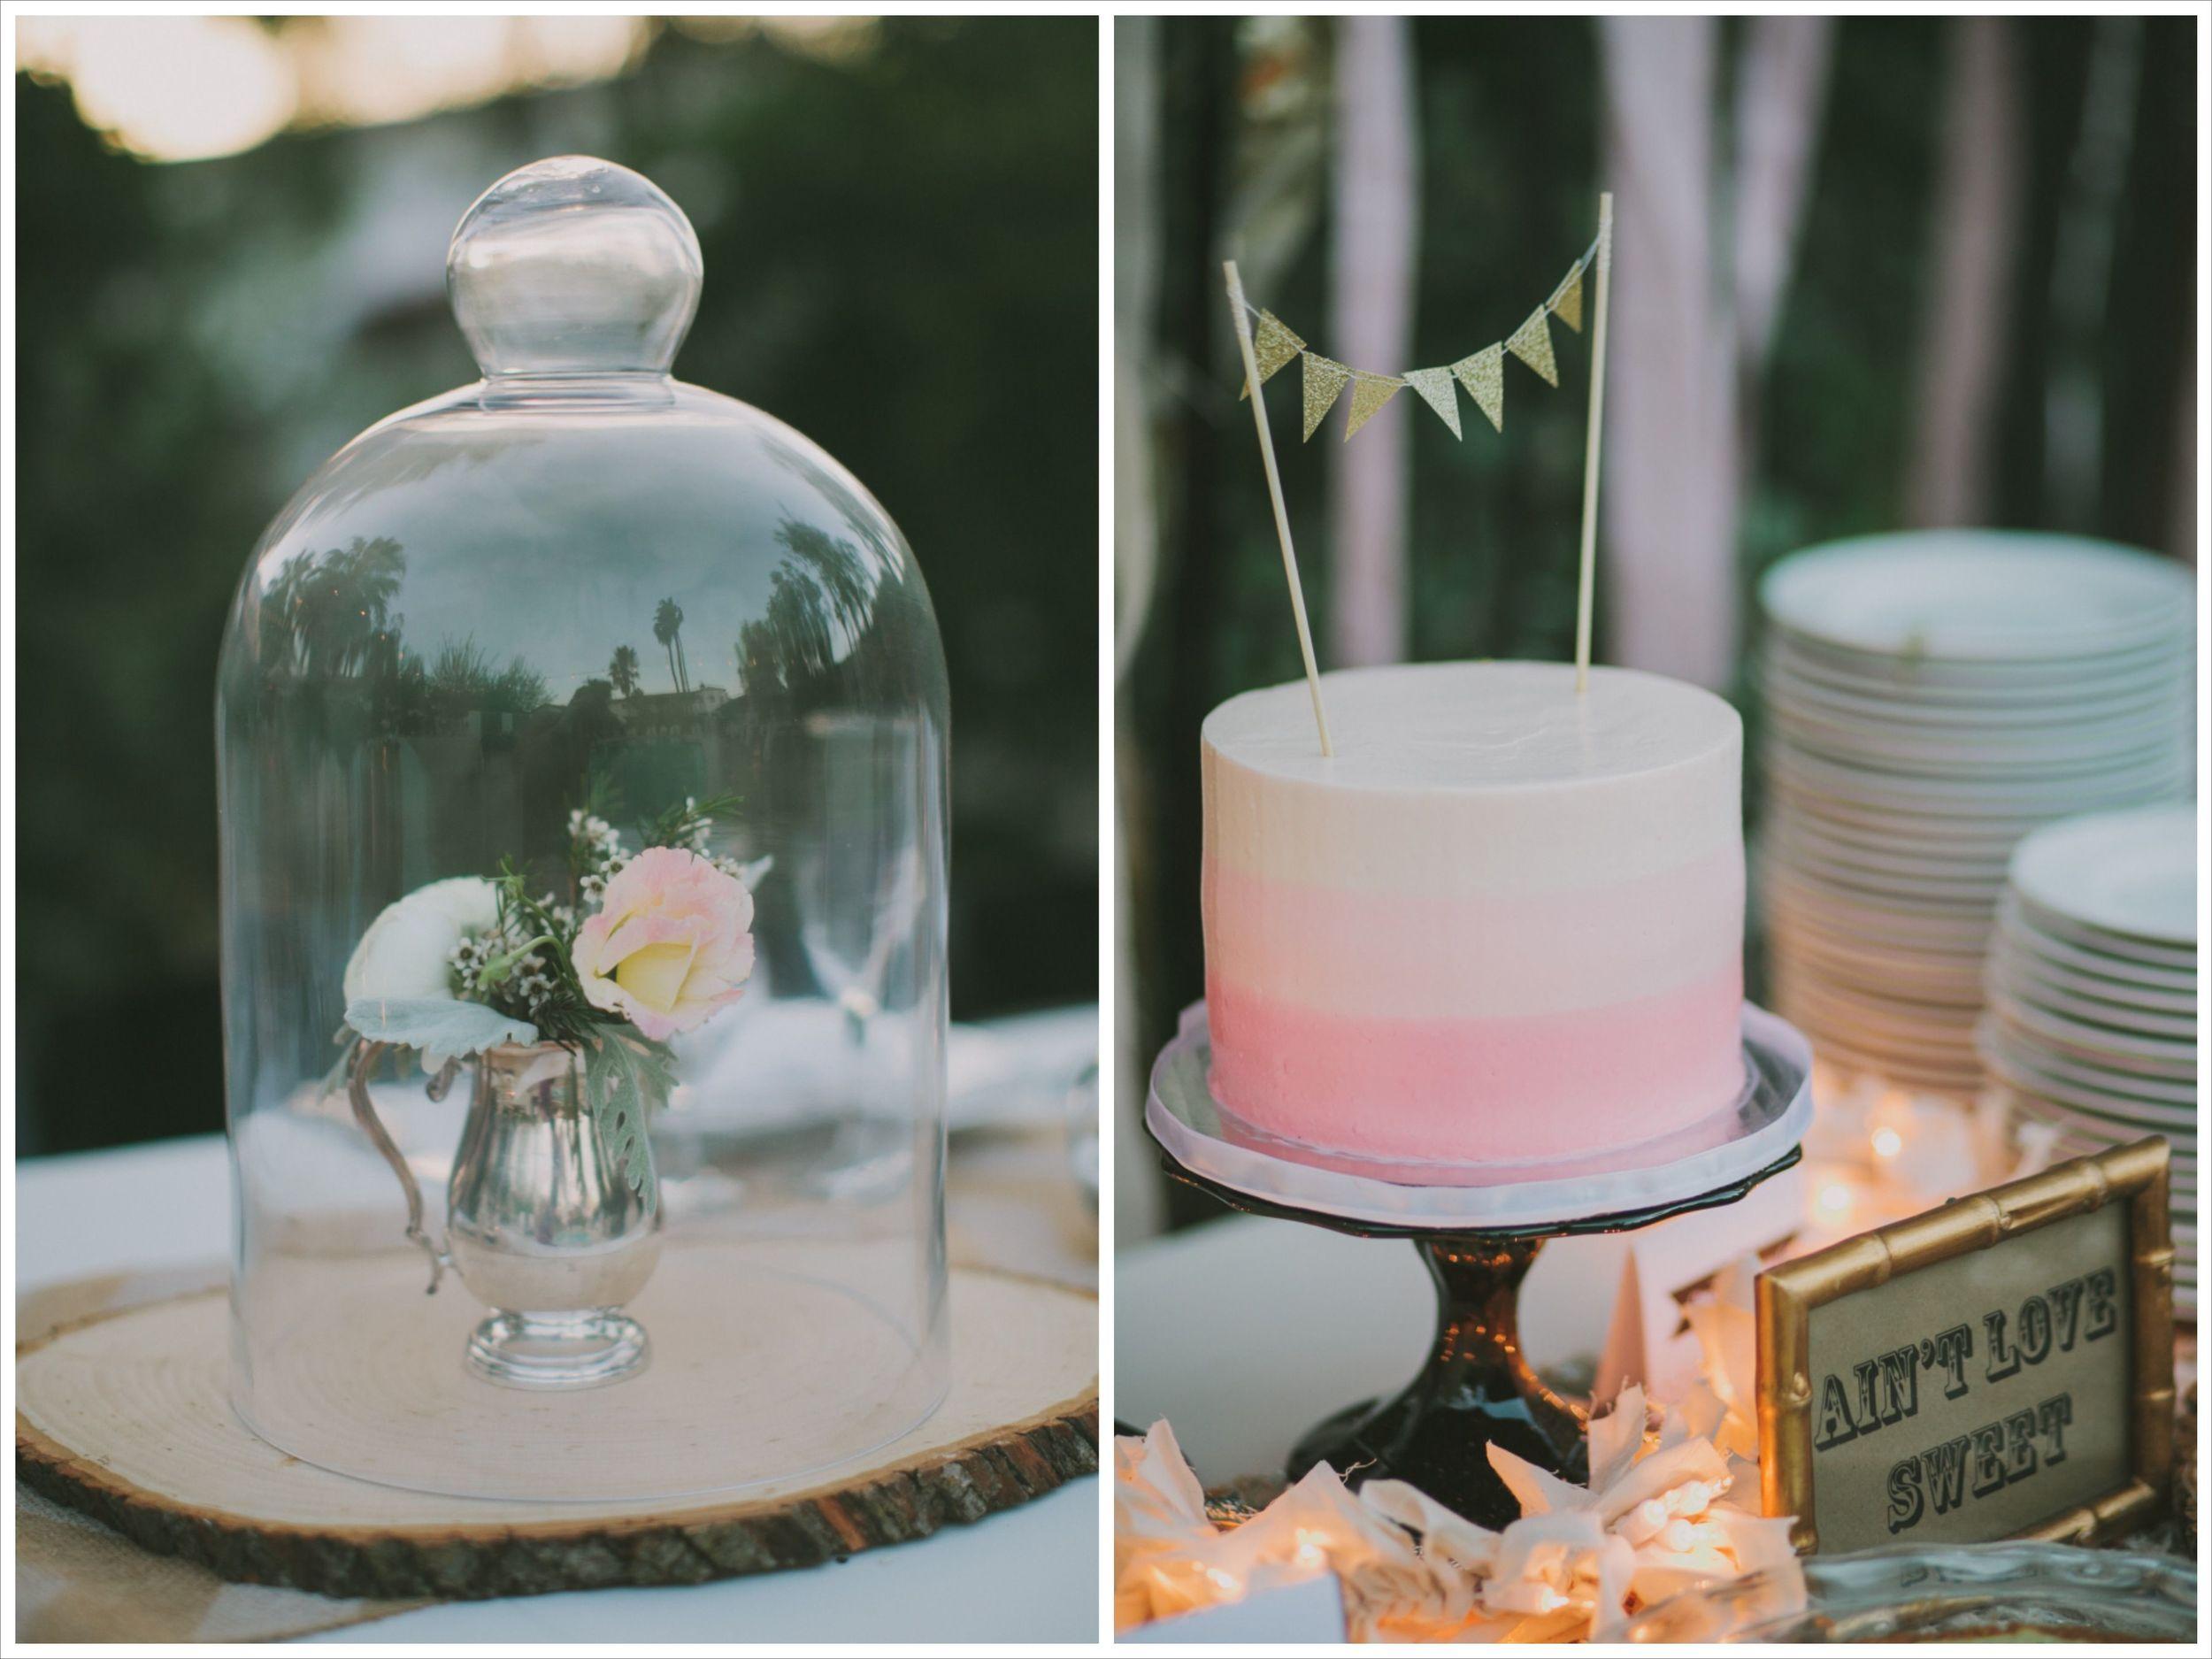 wedding cake and decor from Hotel Alcazar Palm Springs wedding